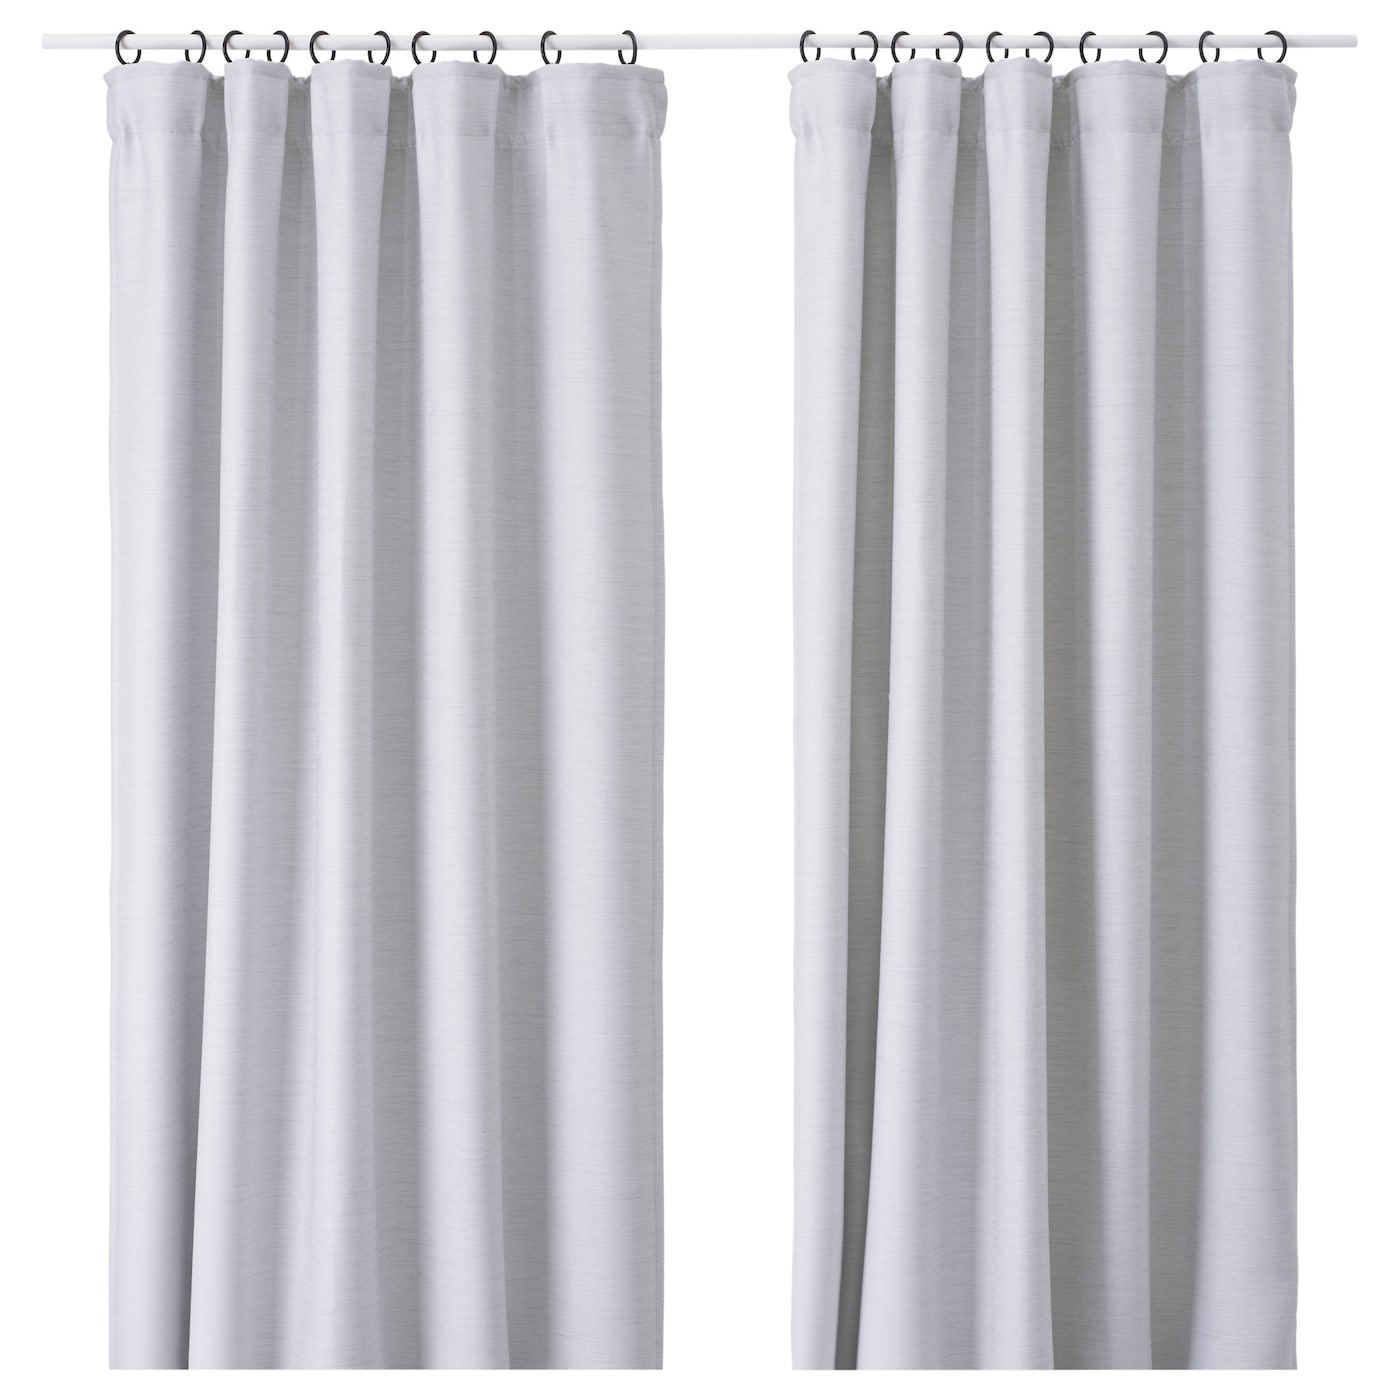 laura fabric fabrics velvet grey invt large curtain villandry curtains resp ashley french view uk